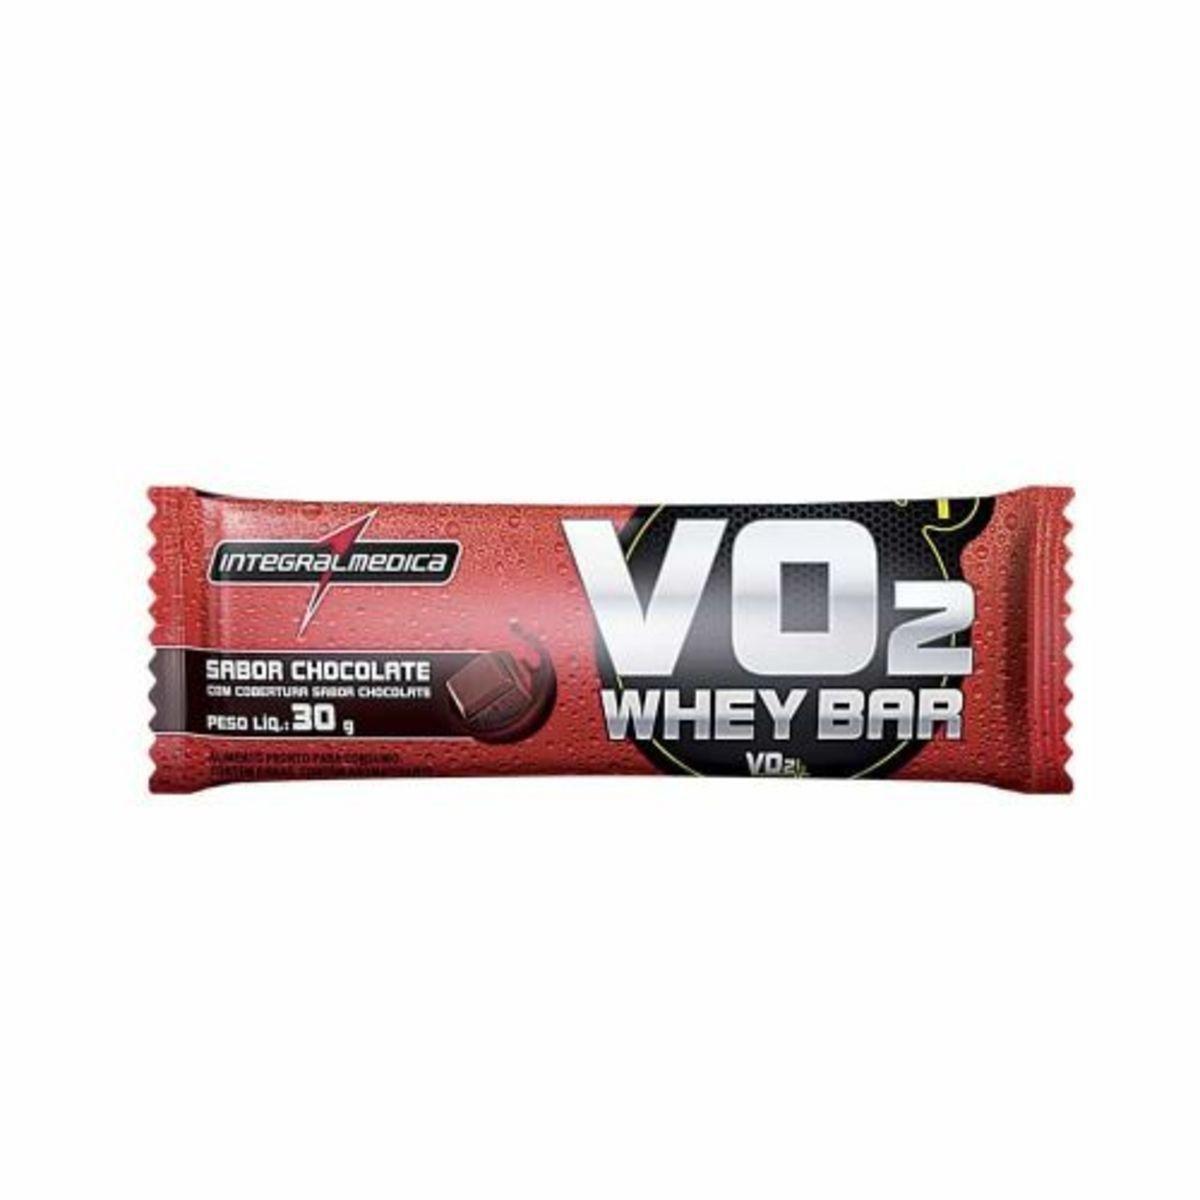 VO2 PROTEIN BAR   30G   CHOCOLATE   INTEGRAL EDICA